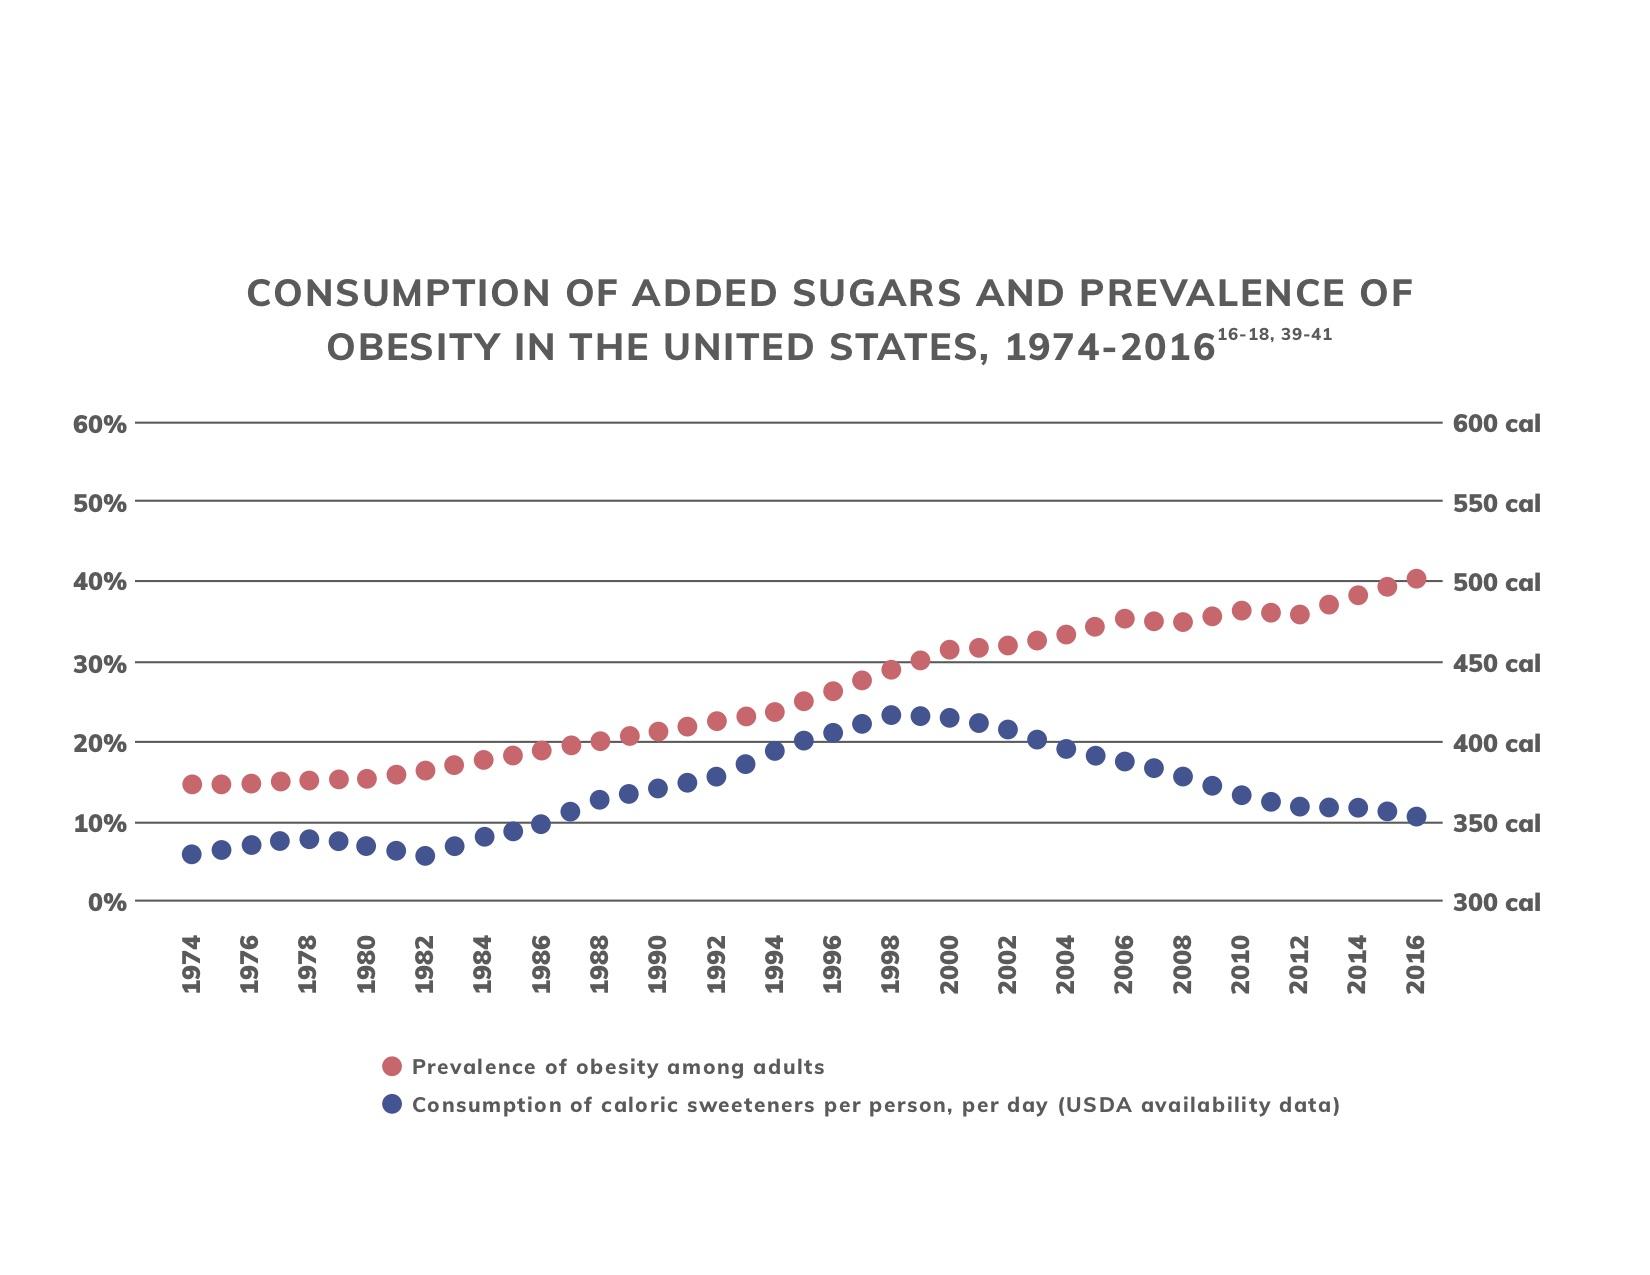 Consumption of added sugar